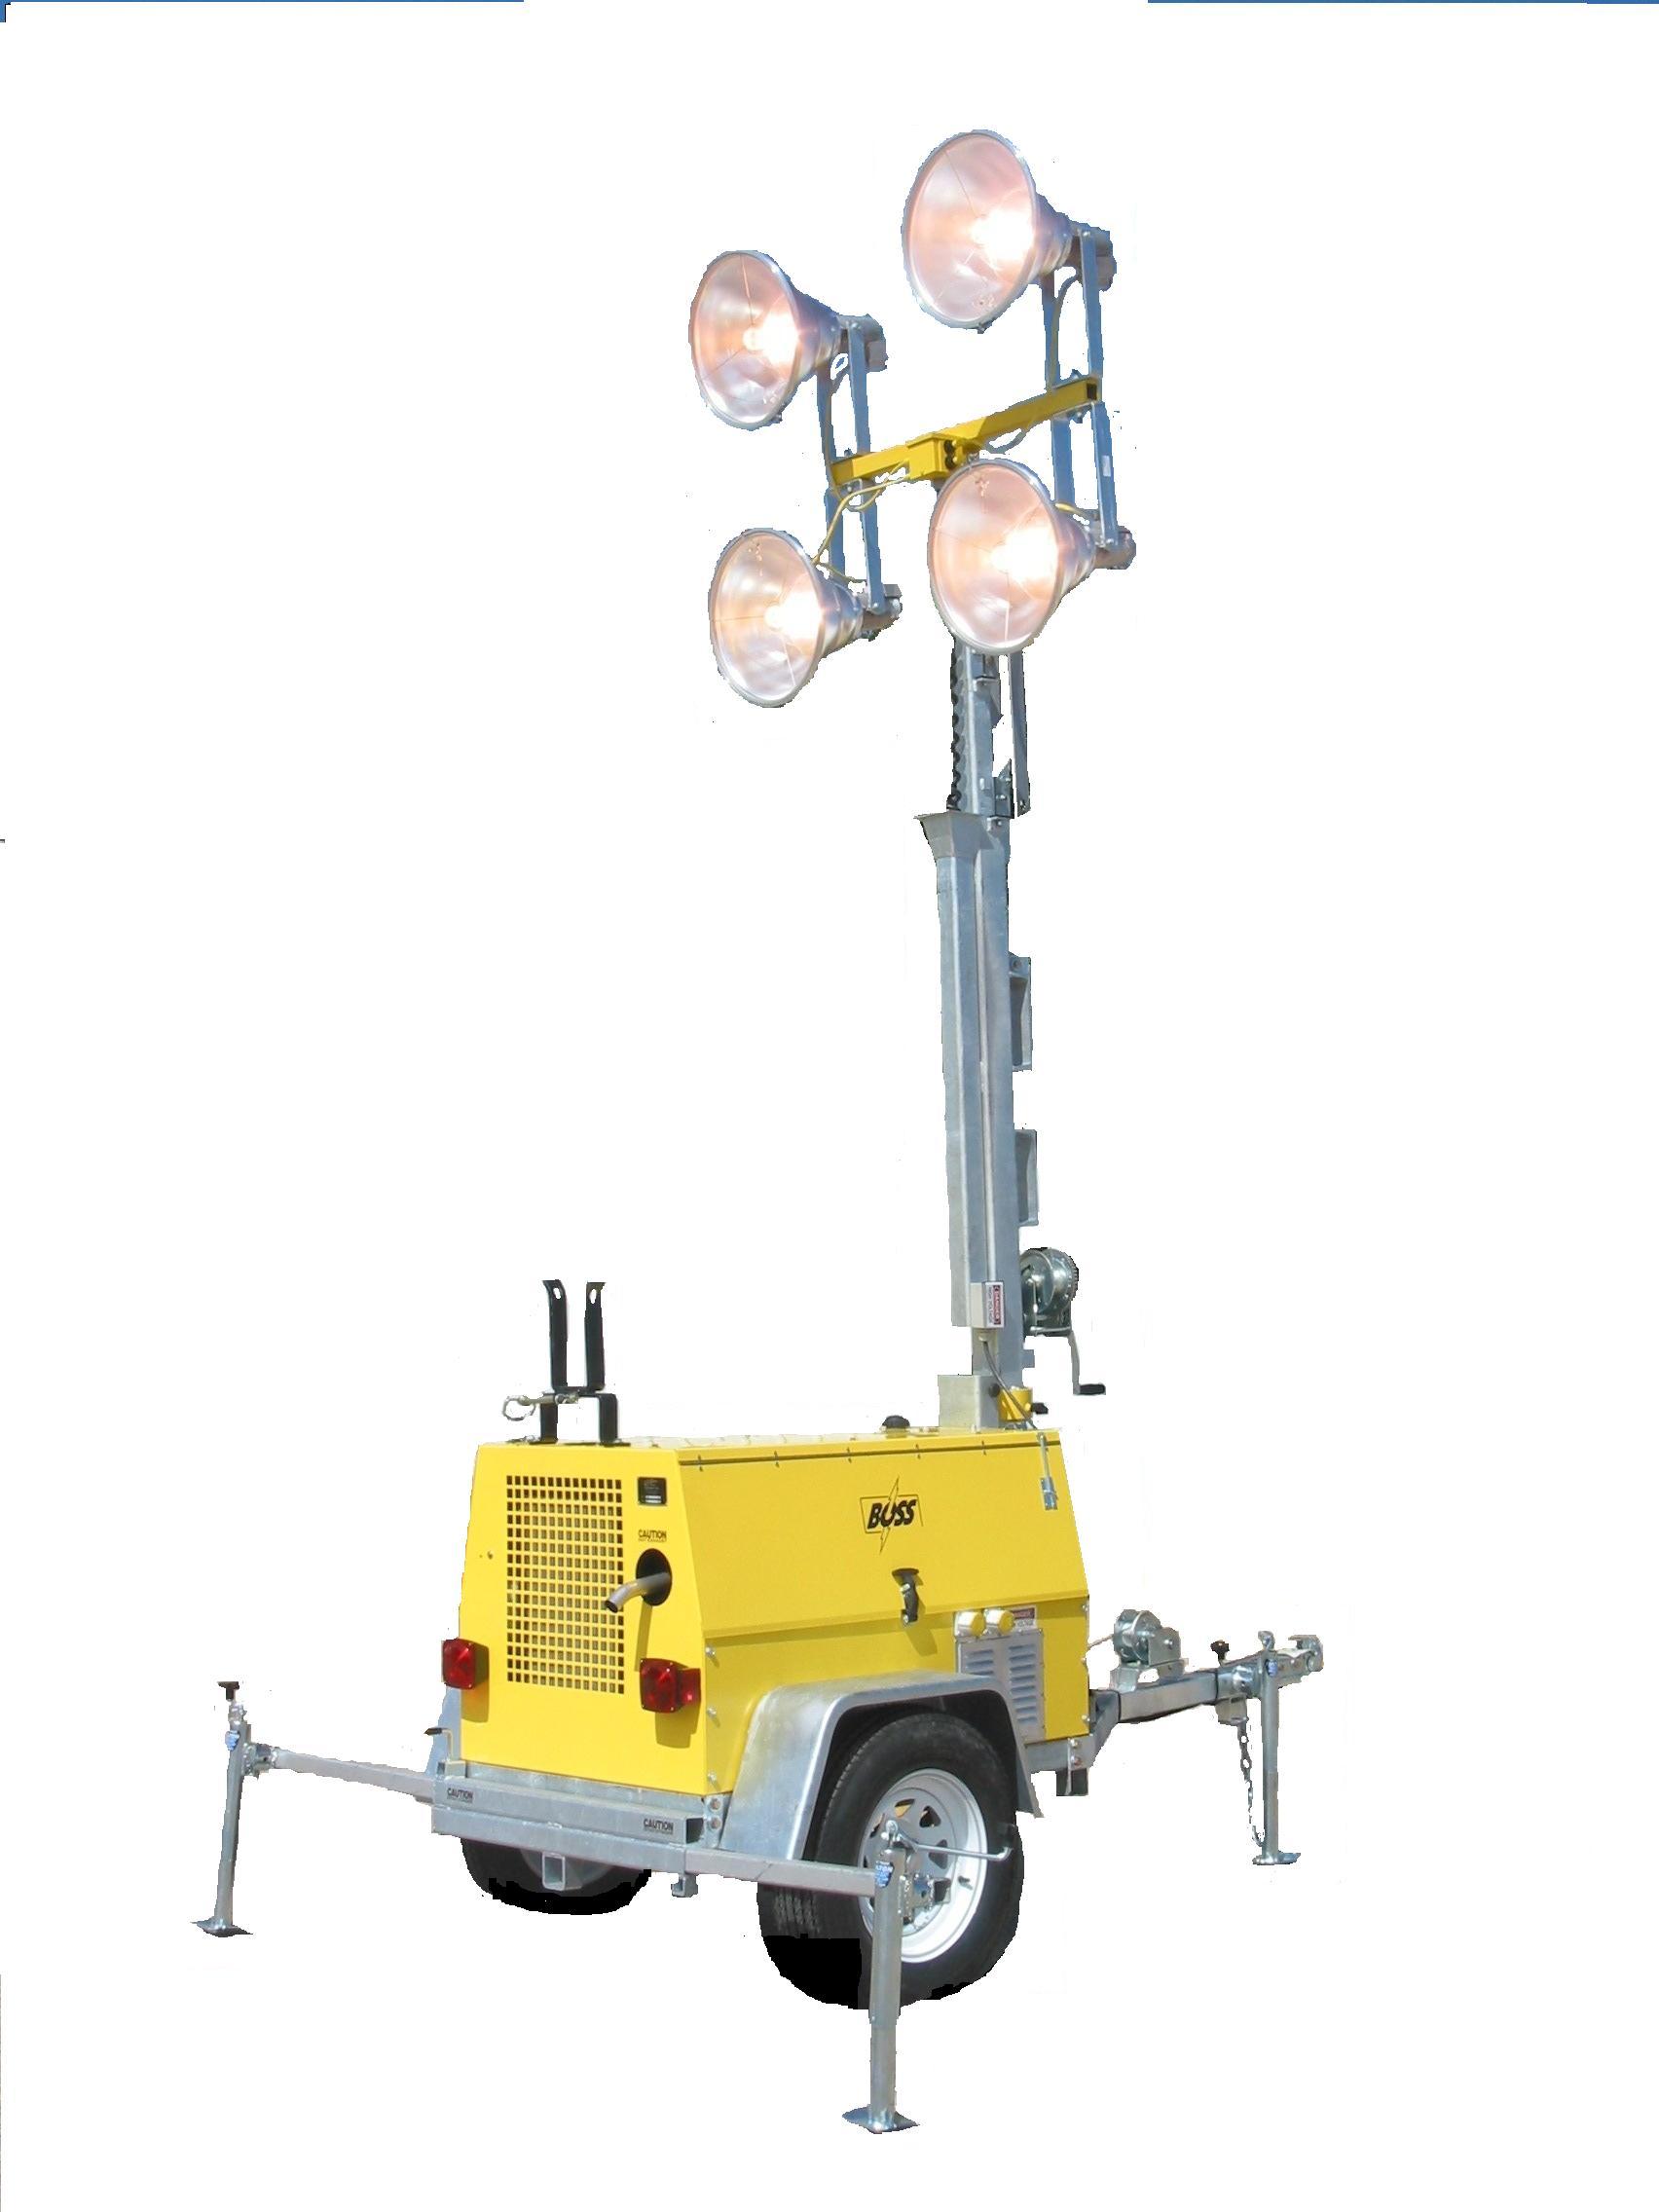 RNT: R&I-BTK64MH-30′: Turn-a-Round Standard Light Tower, 30′ Tower, 4-1000W Floodlights, 6KW Diesel, Trailer Mounted